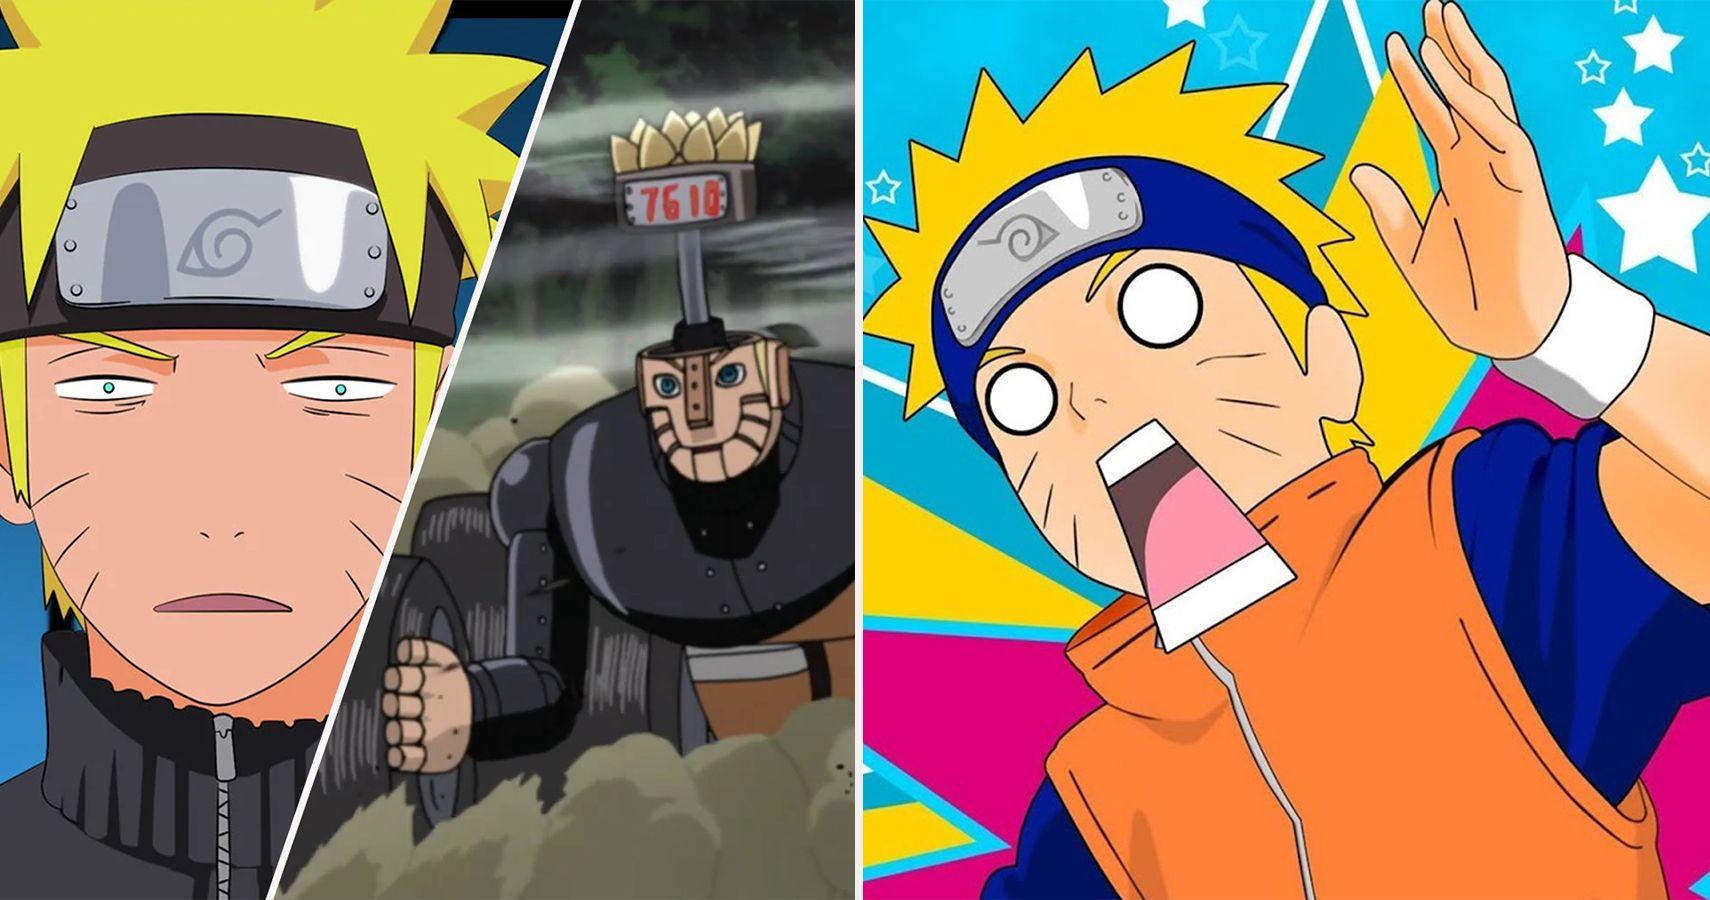 25 Glaring Problems With Naruto Fans Won't Admit | TheGamer